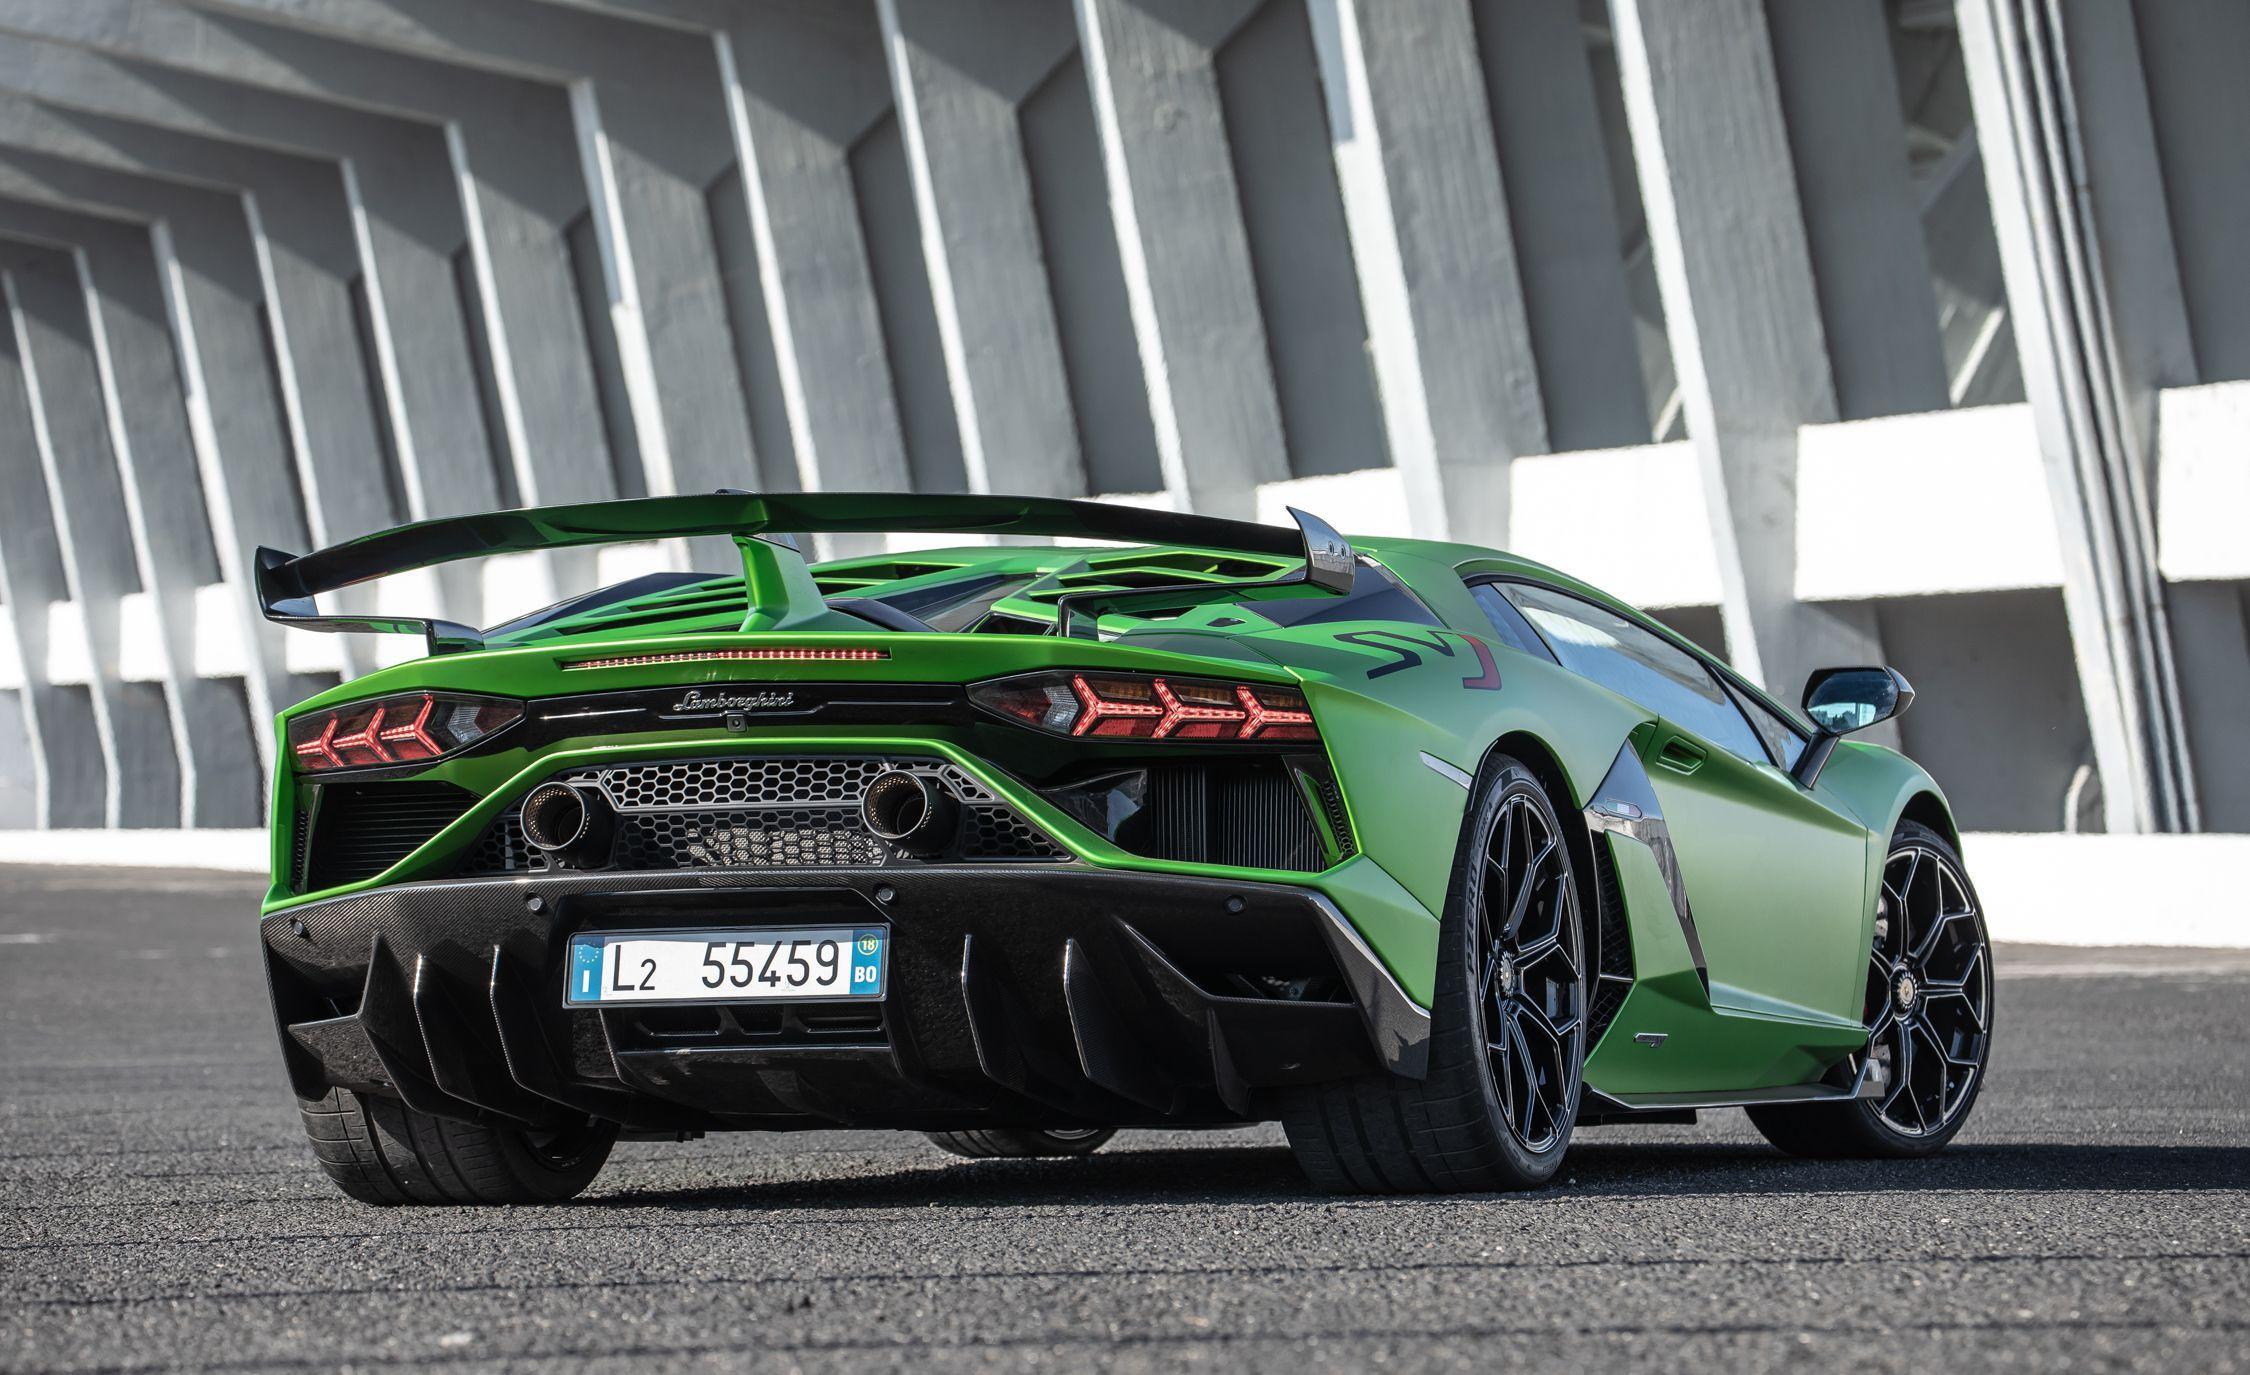 2019 Lamborghini Aventador Svj Rear Wallpaper 153 Hd Wallpapers